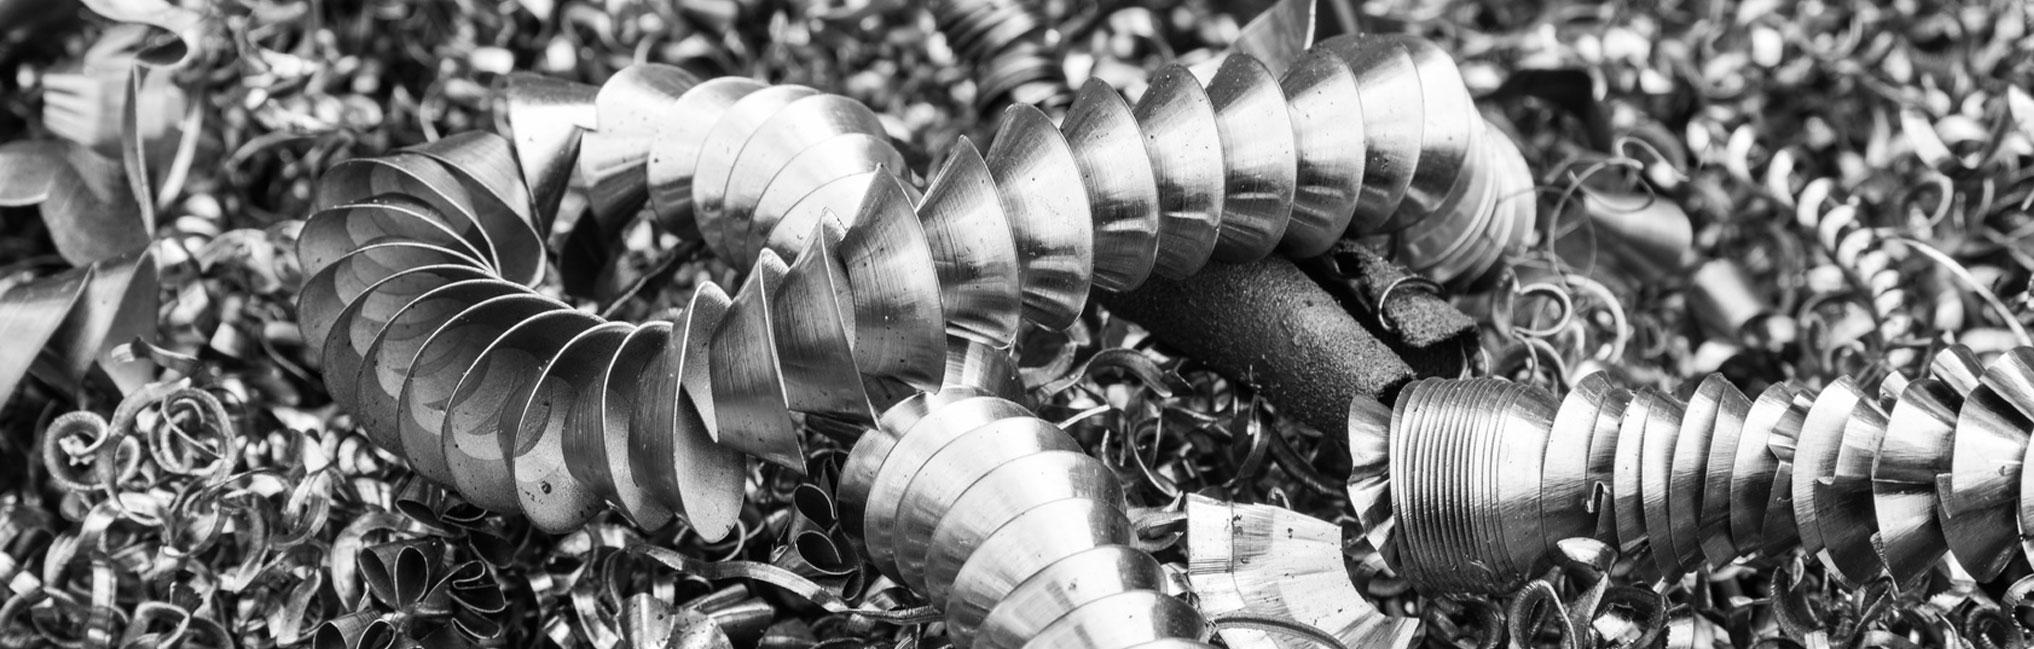 Viele graue Edelstahl-Späne.